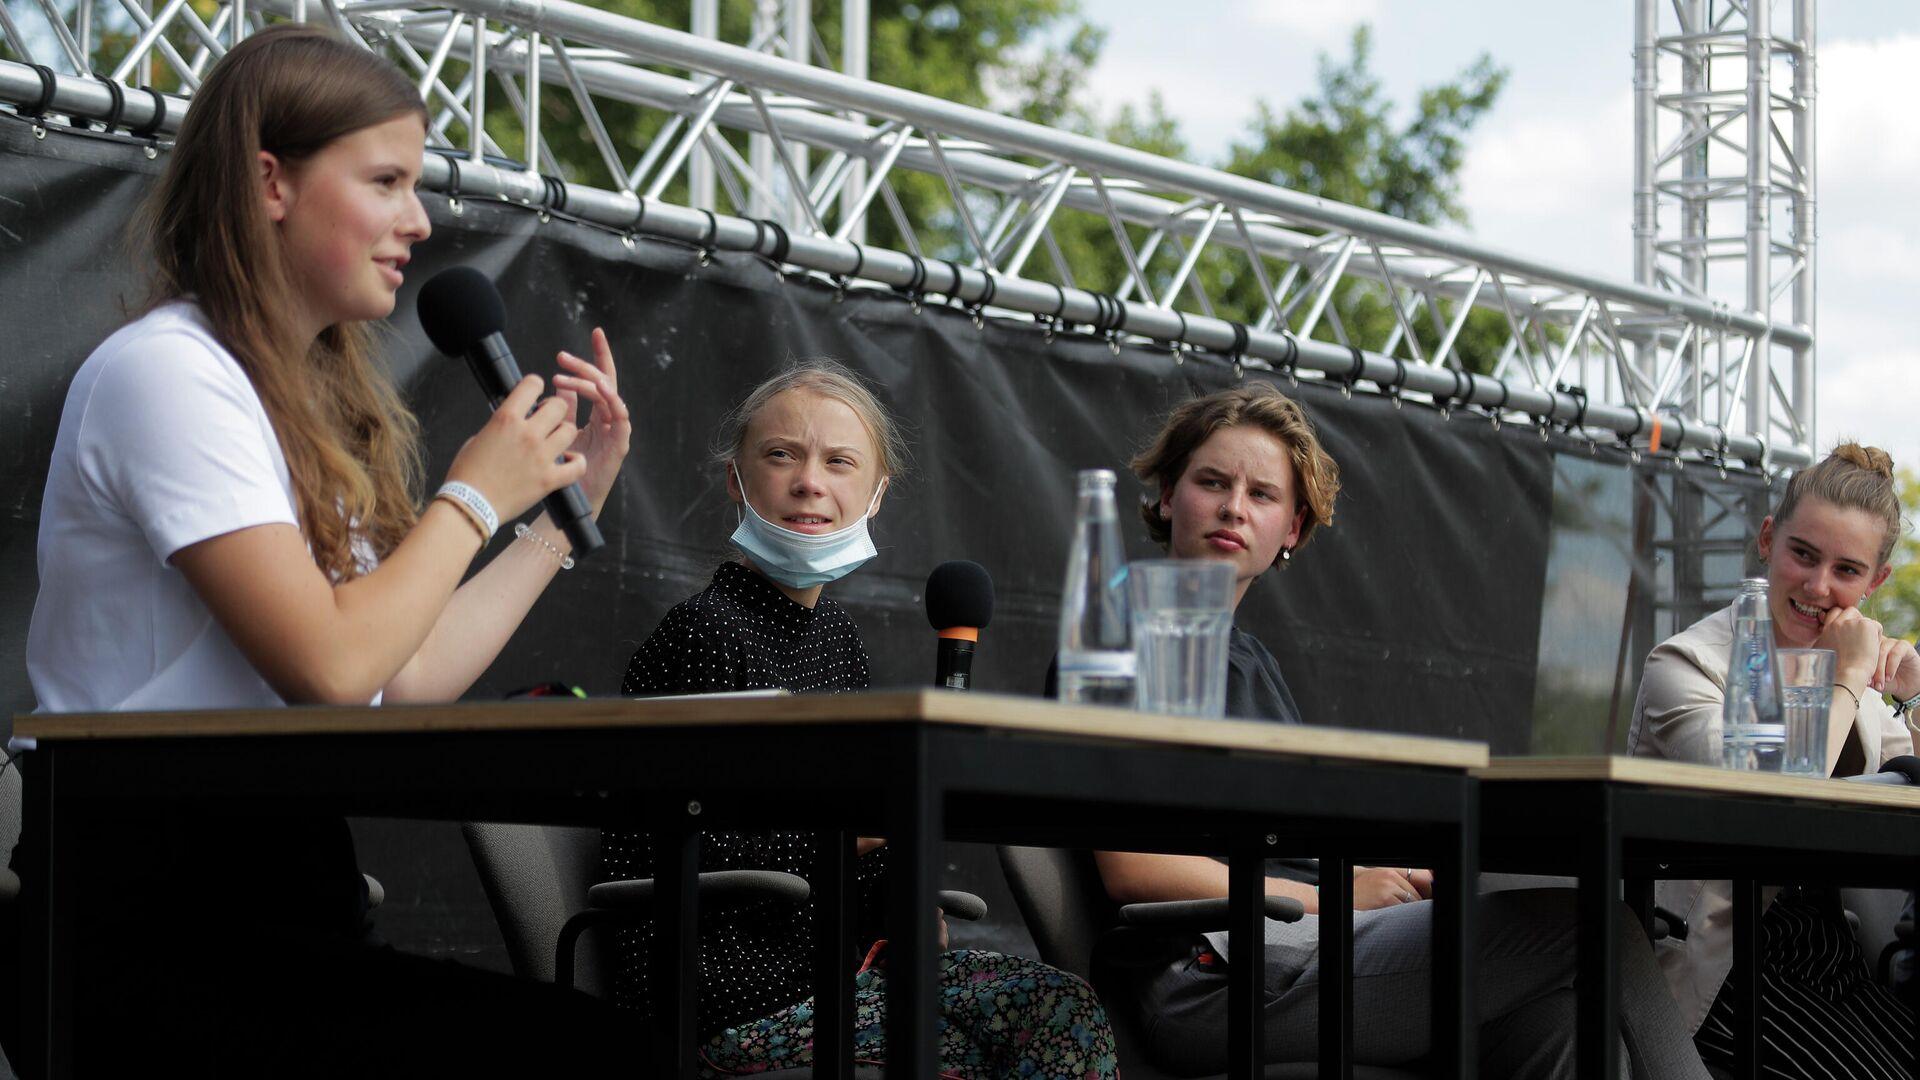 Luisa Neubauer, Greta Thunberg, Anuna de Wever und Adelaide Charlier in Berlin (Archiv) - SNA, 1920, 24.07.2021